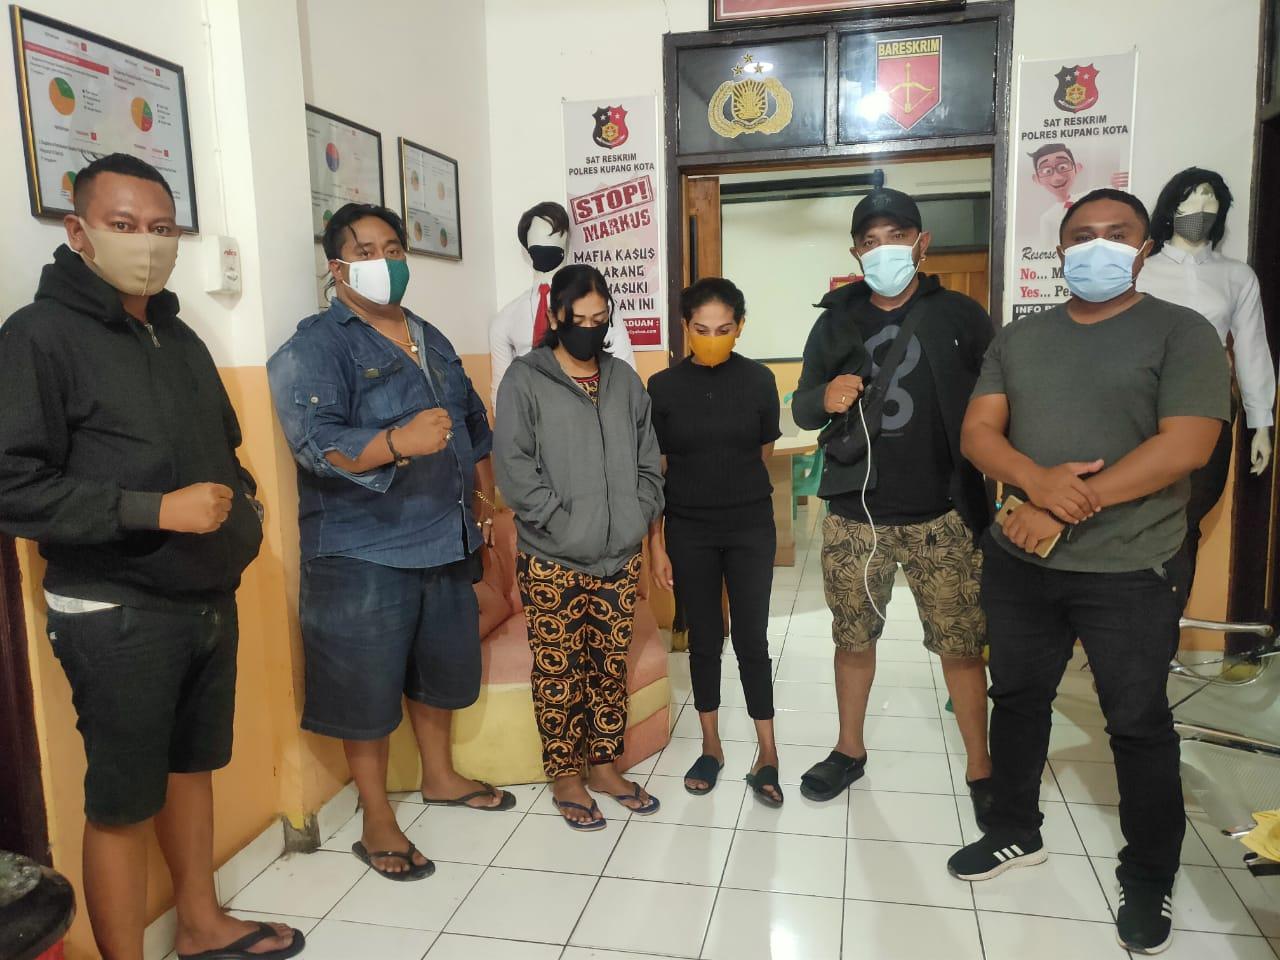 Polisi Tangkap Tiga Perempuan Pencuri Pakaian di IAN Butik Kupang, Ada Istri Kades